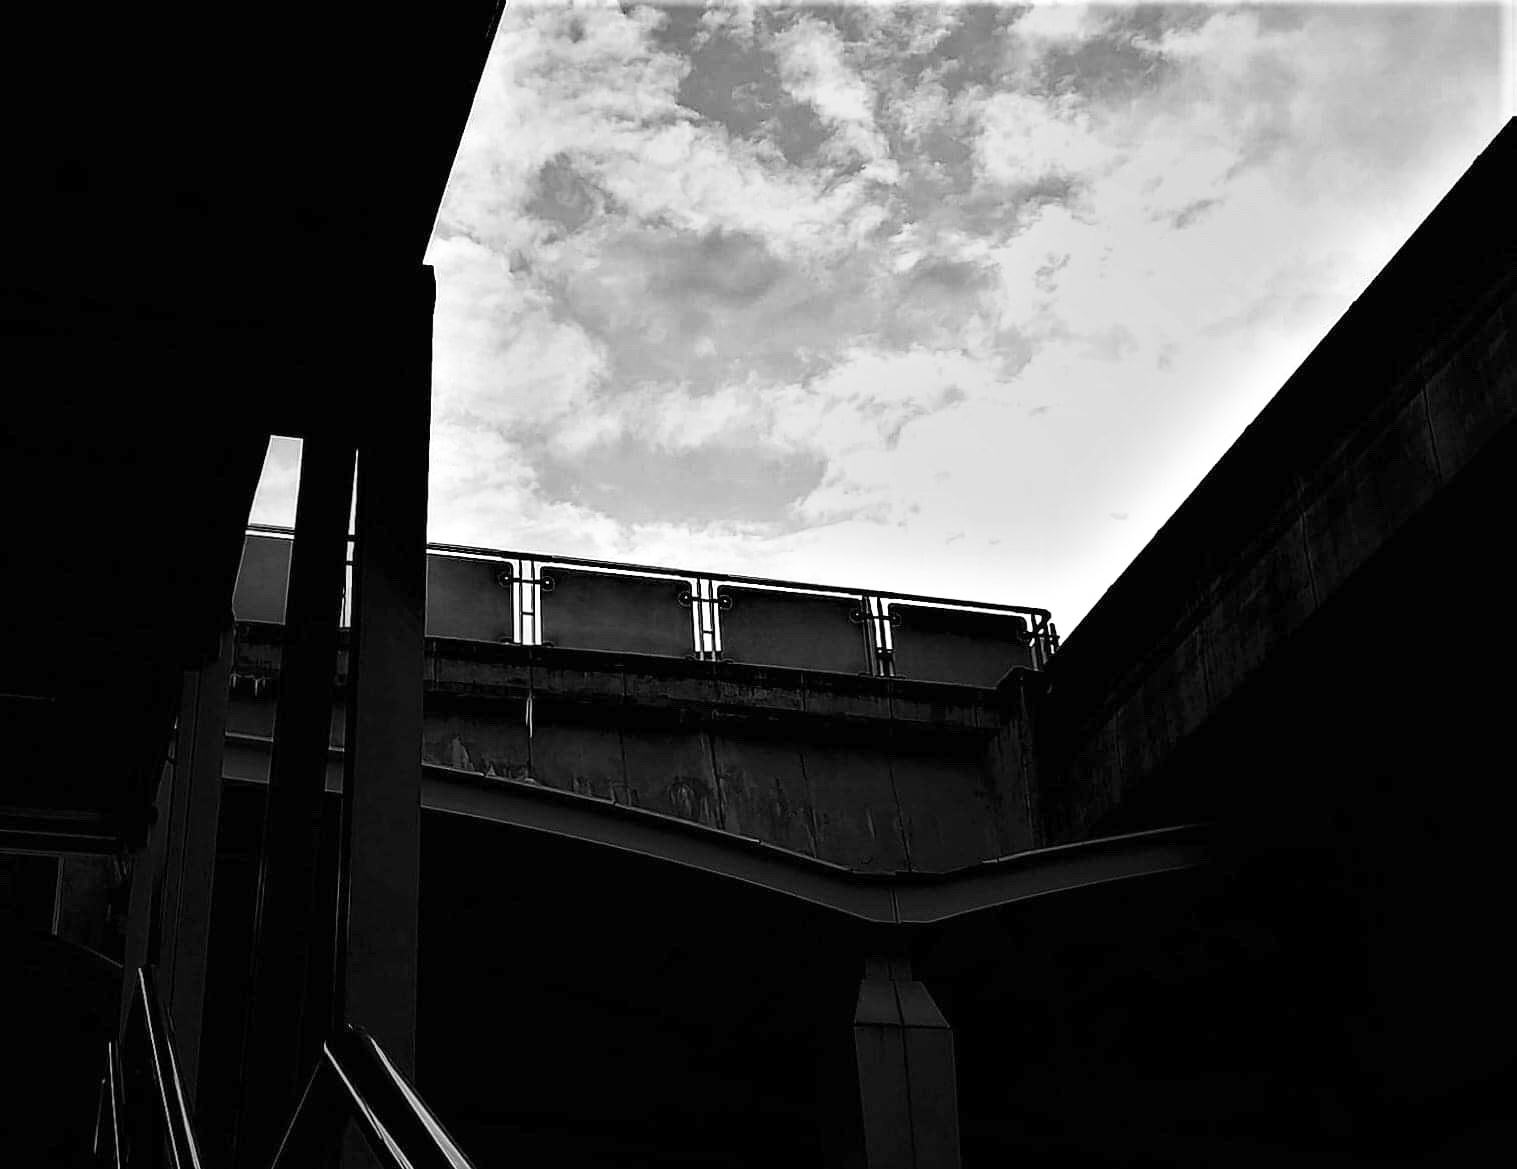 LIGHT AND SHADOW OF SKYTRAIN STATION 🚝🚇🚊💡☀️ ( แสงเงาสถานีรถไฟฟ้า 🚝🚇🚊💡☀️ )